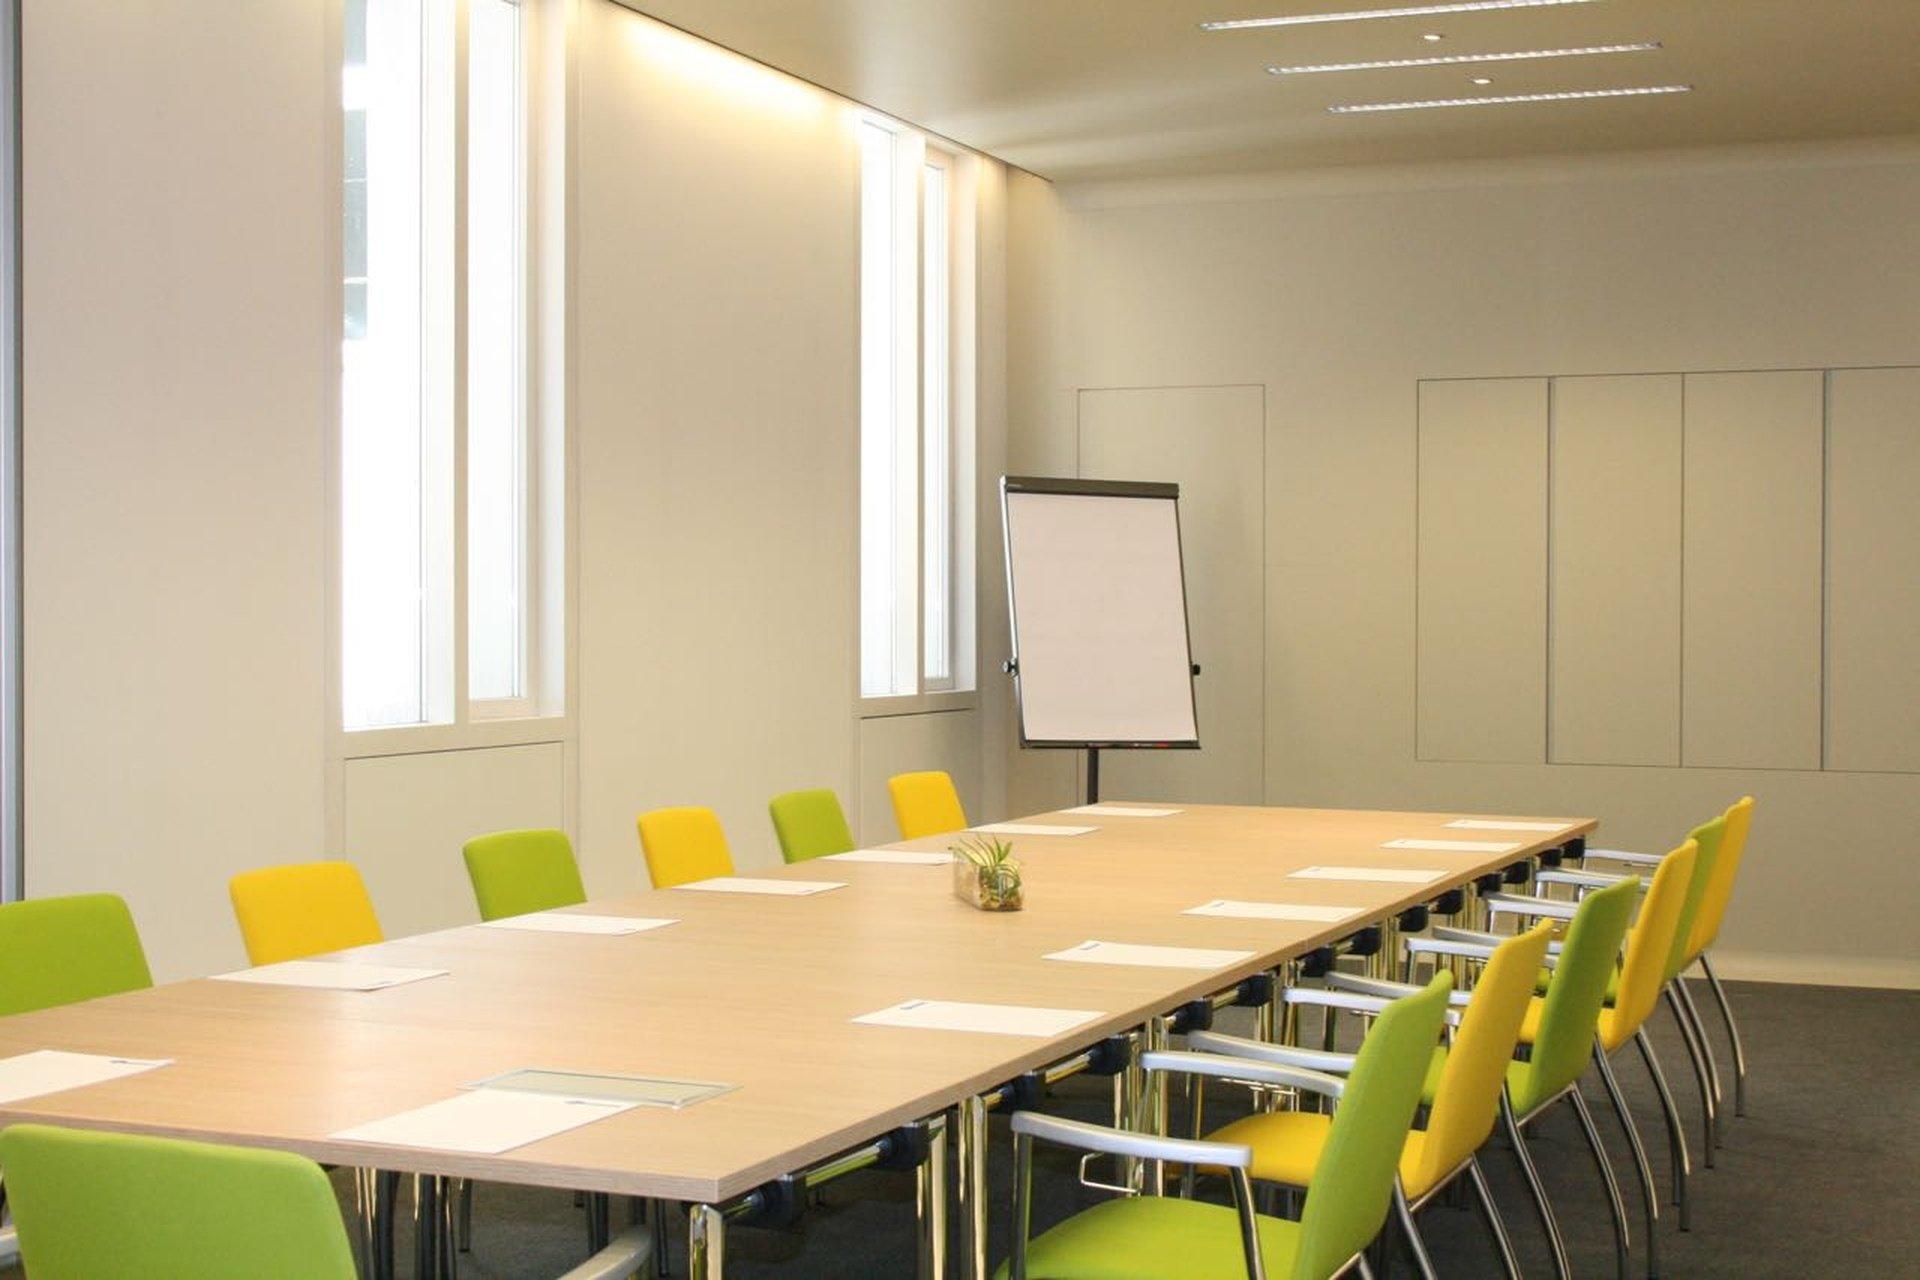 Vienna seminar rooms Historic venue Your Office - Albert Camus image 0